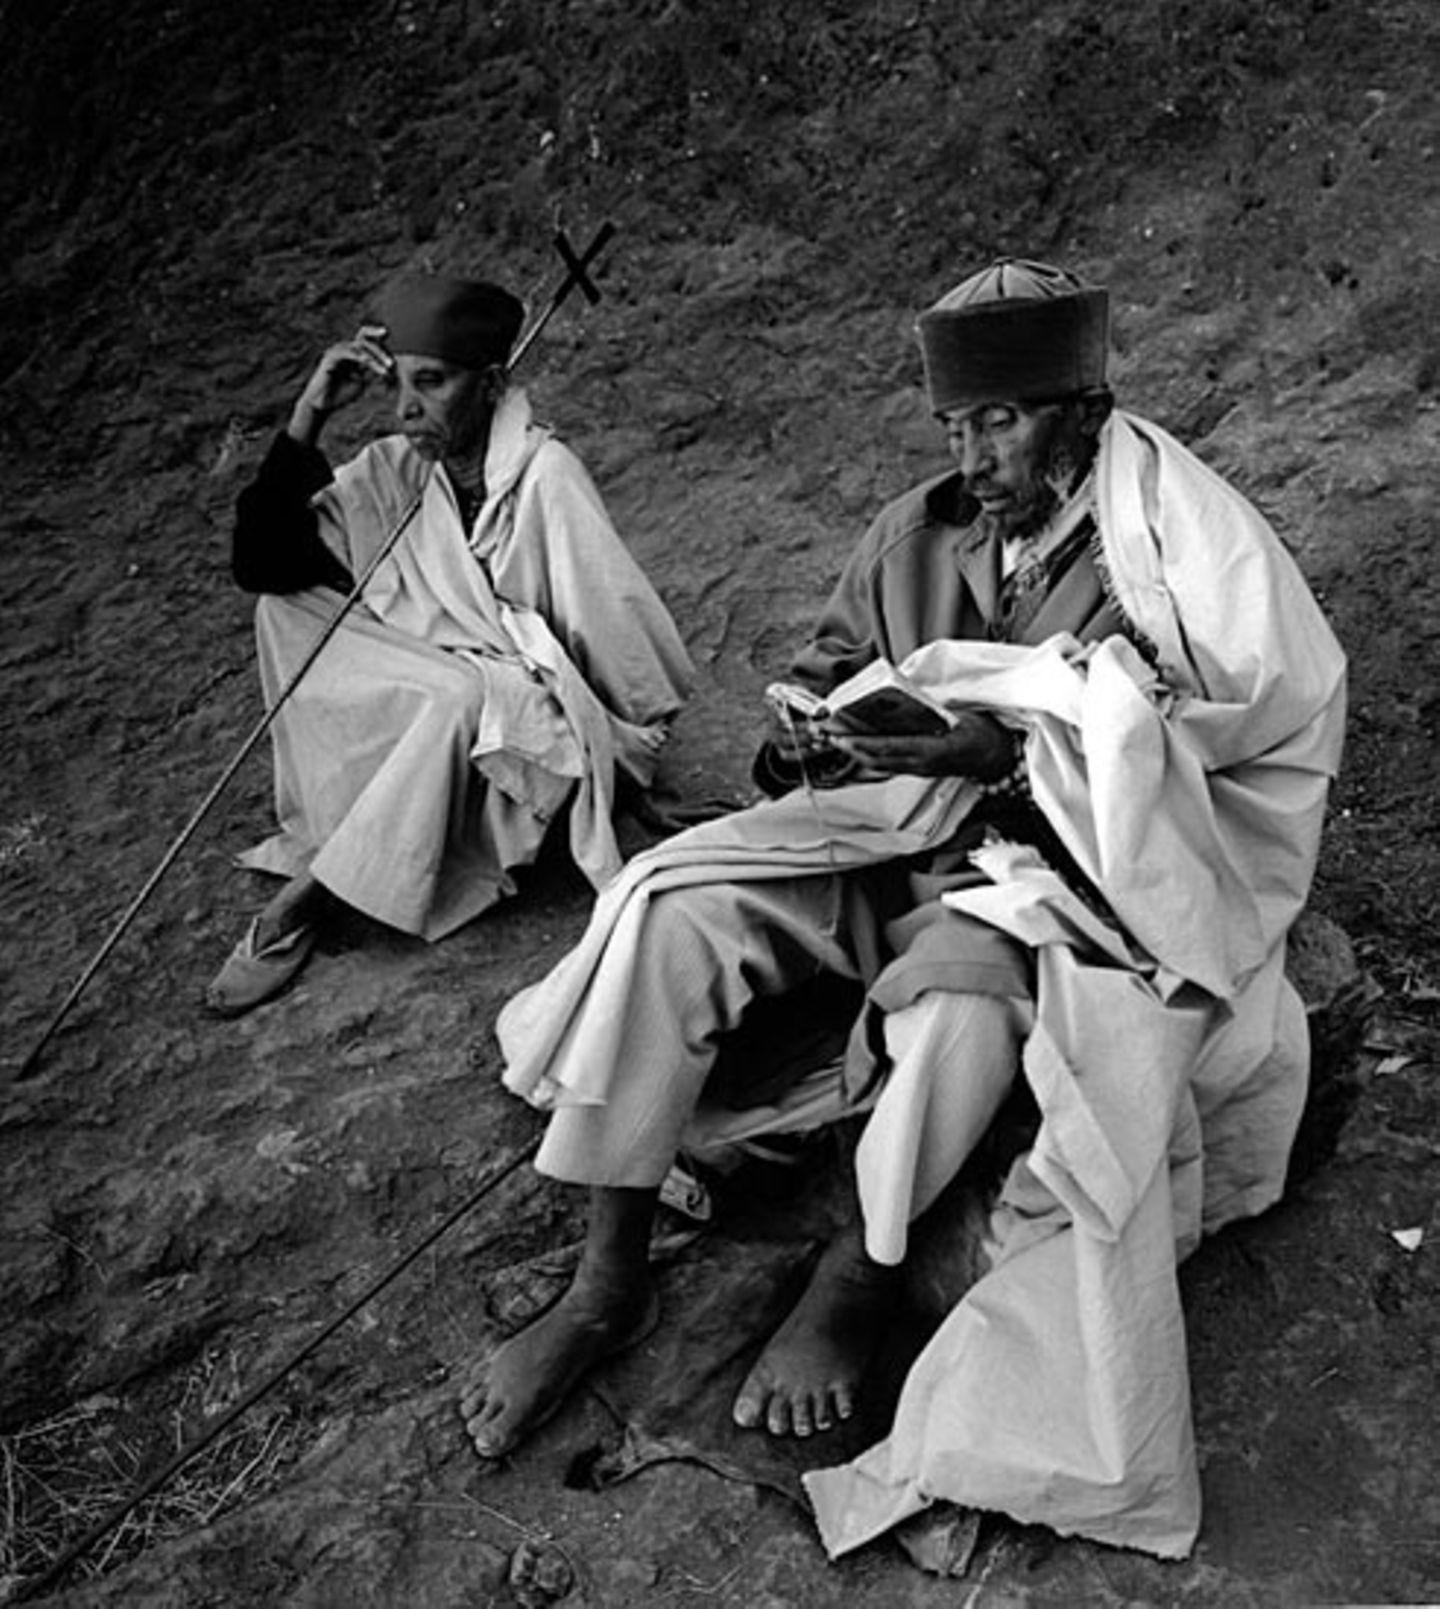 Fotogalerie: Bildband Ethiopia - Bild 4